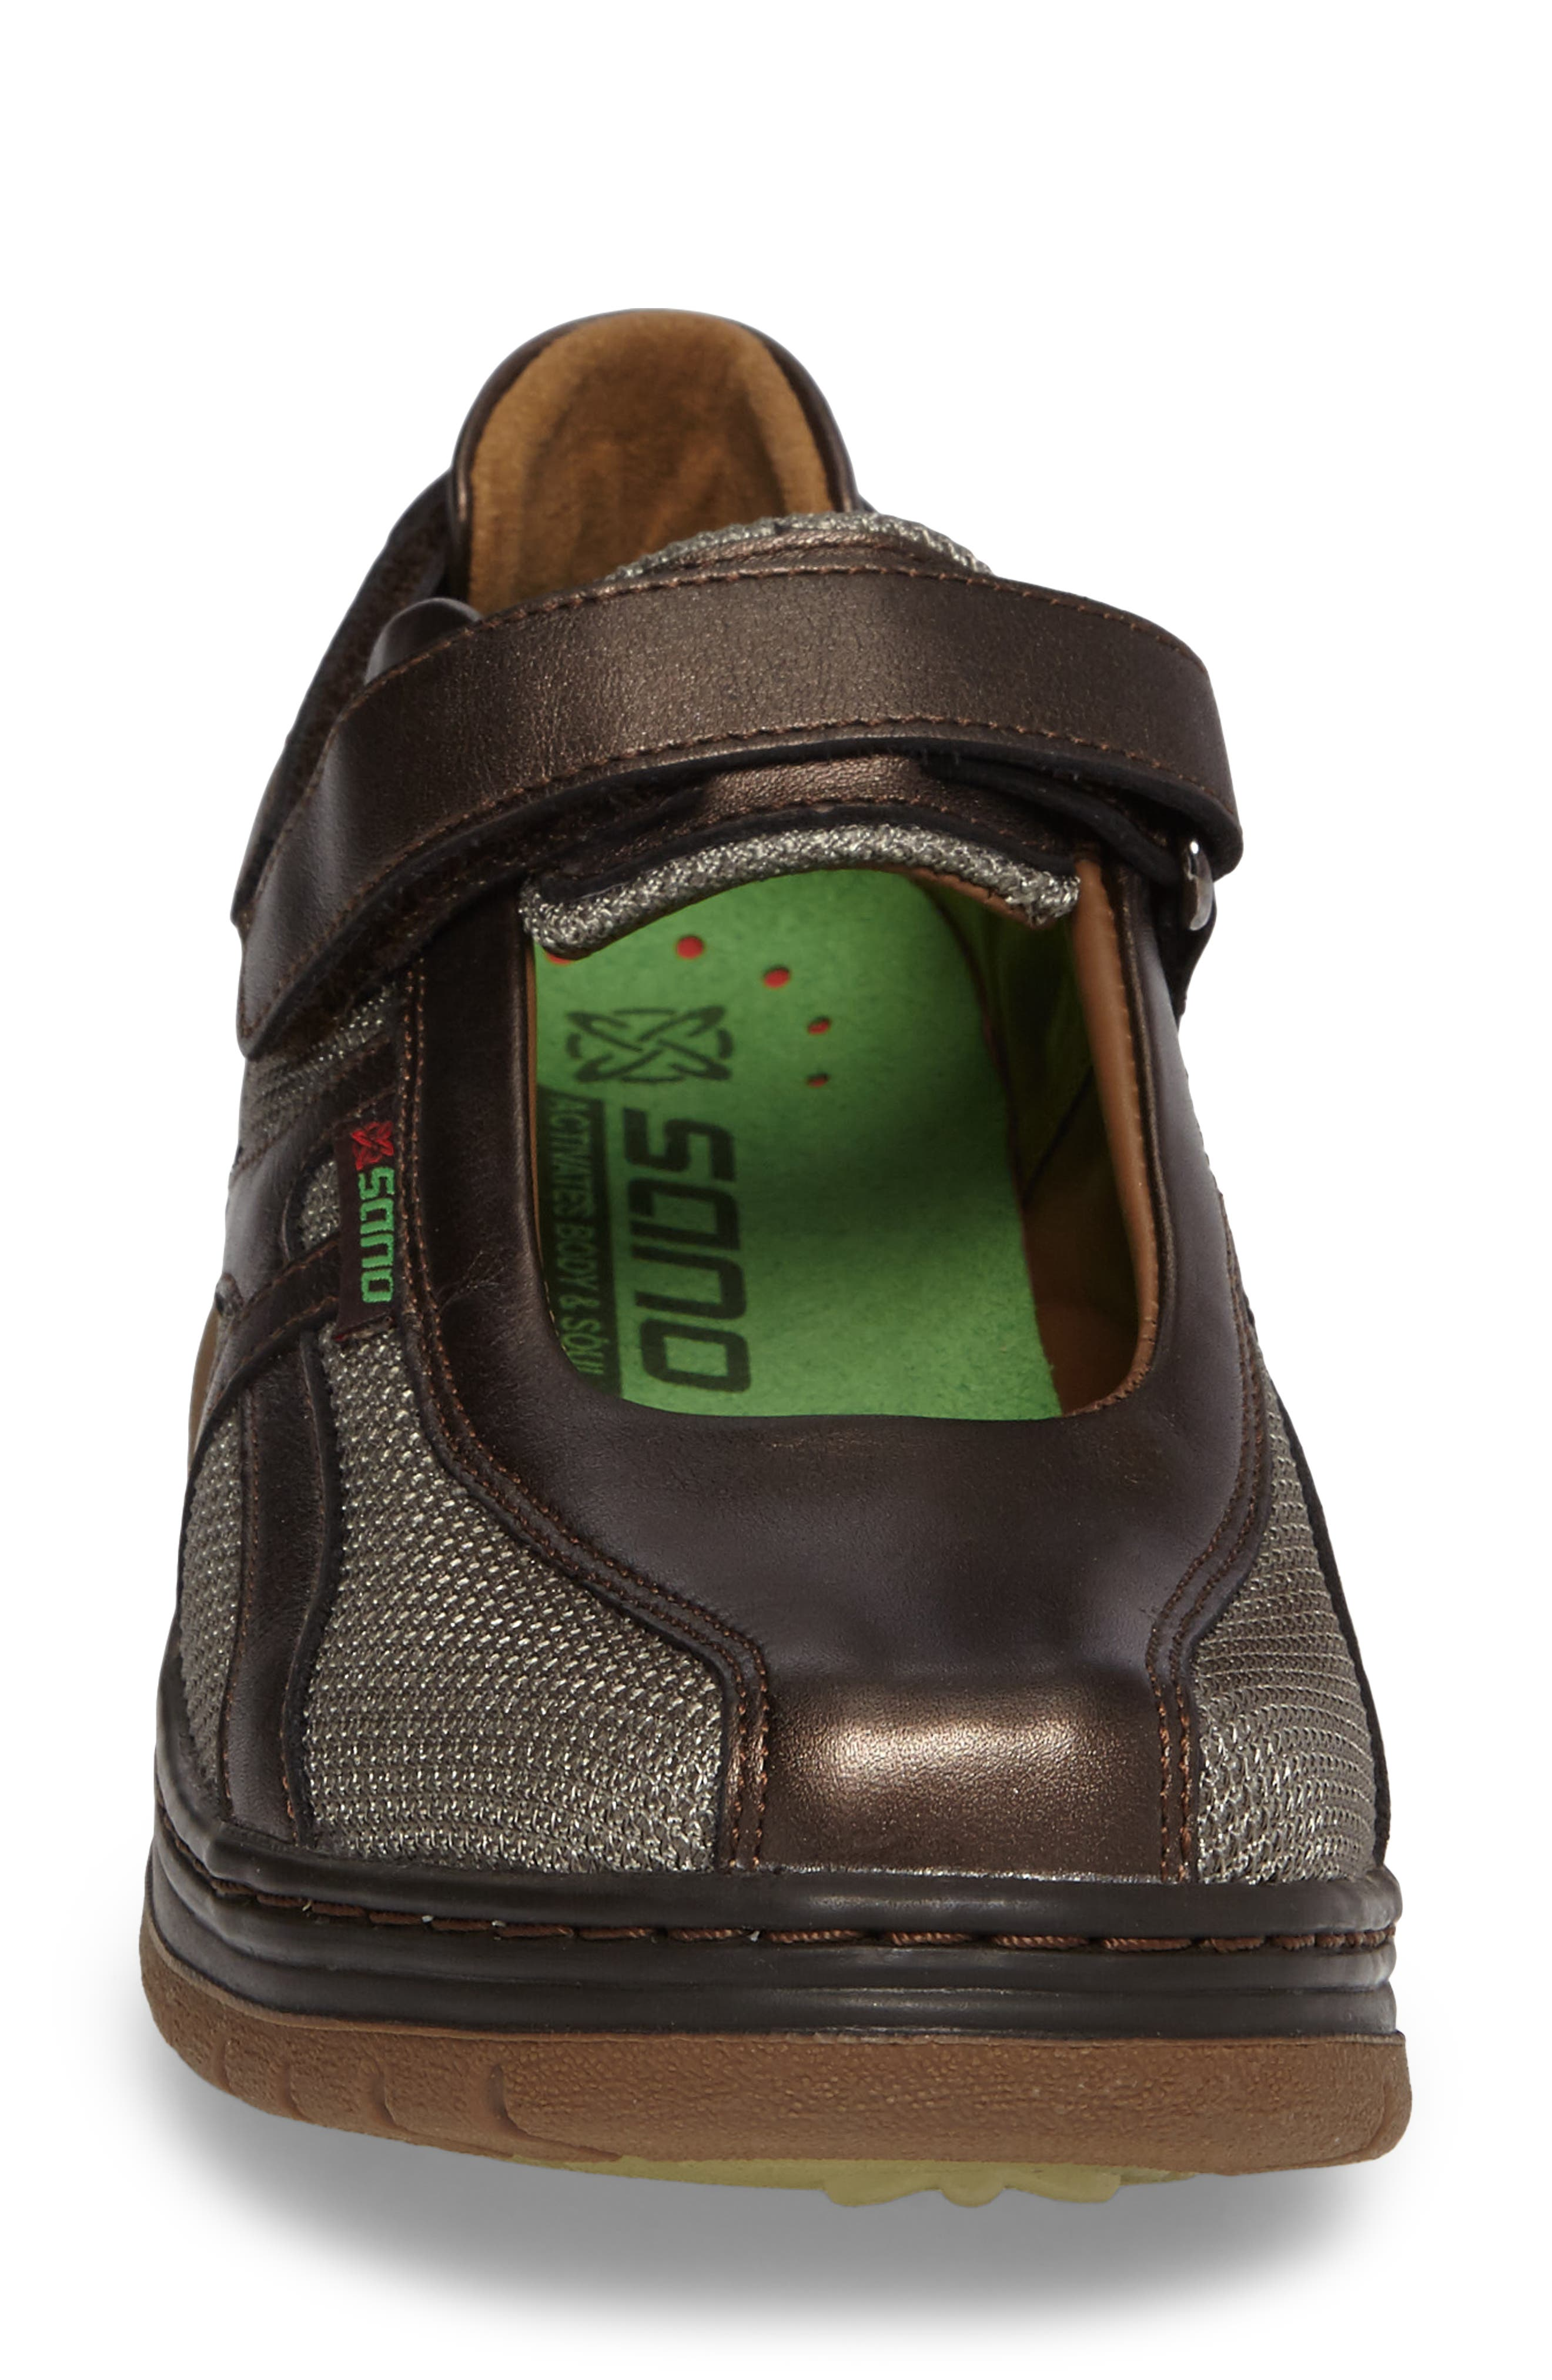 Alternate Image 4  - Sano by Mephisto 'Excess' Walking Shoe (Women)